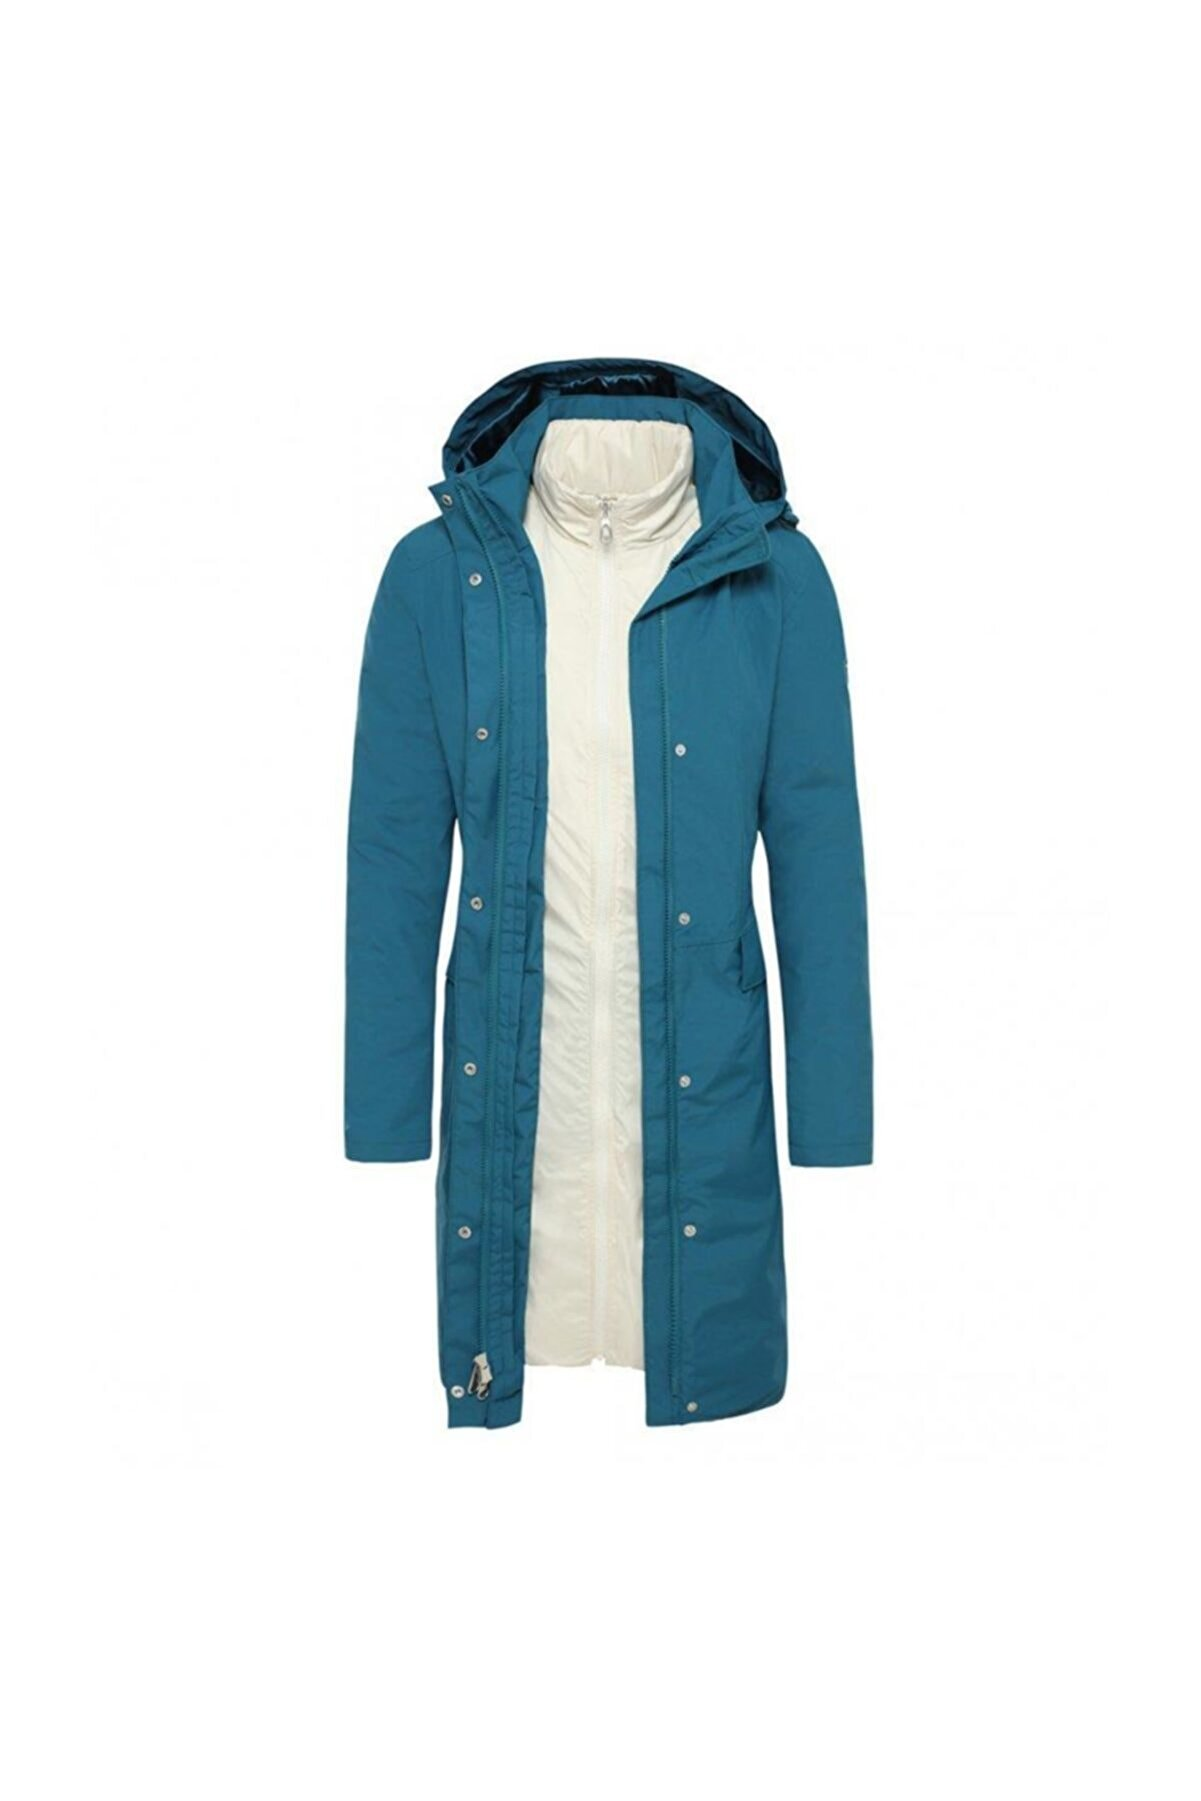 The North Face Suzanne Triclimate Kadın Ceket - T0CMH2EFS